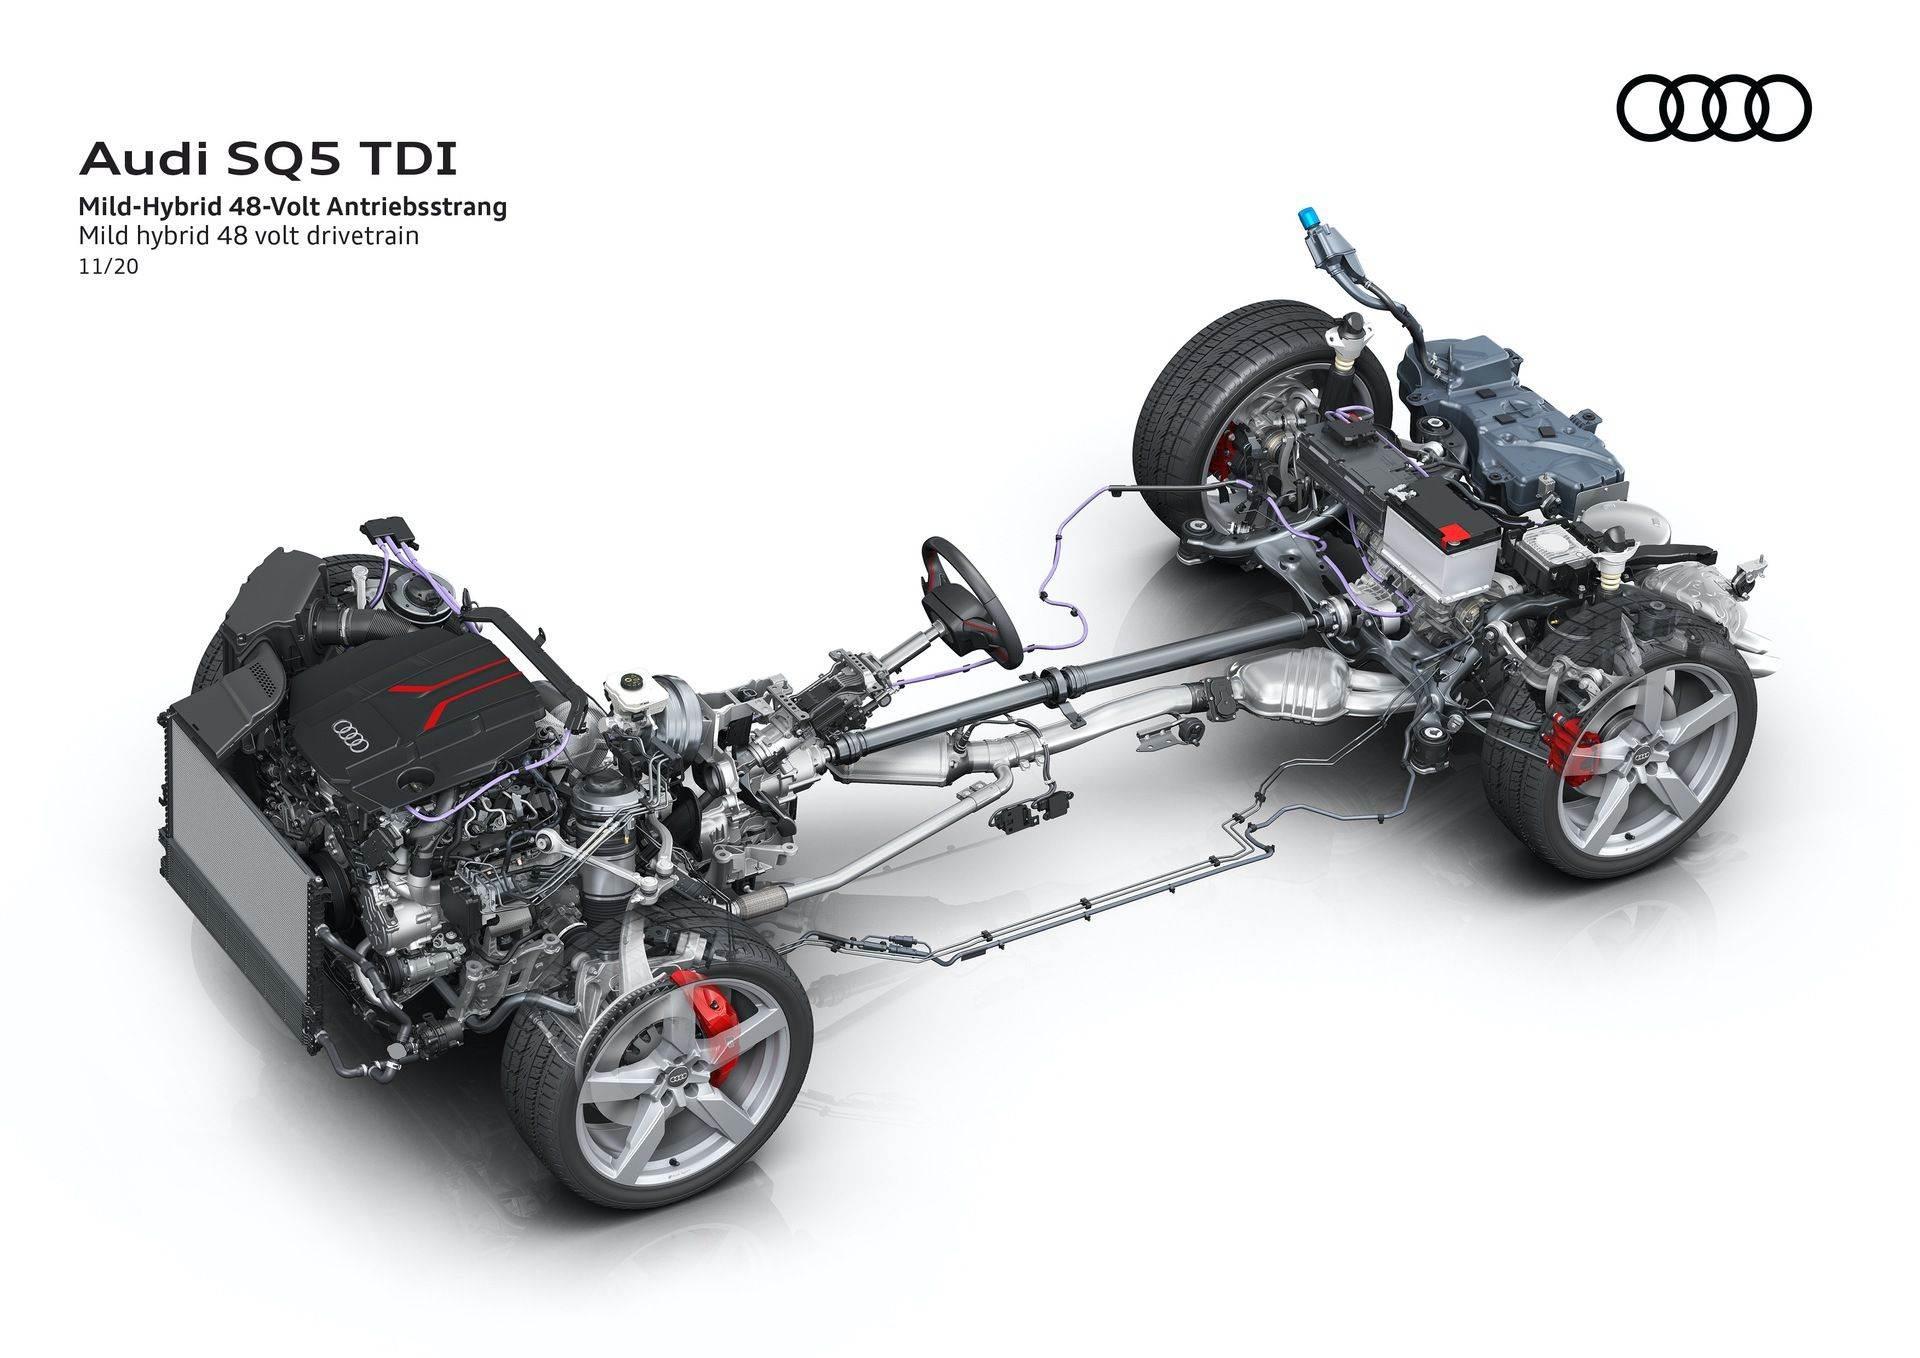 2021_Audi_SQ5_facelift_0013